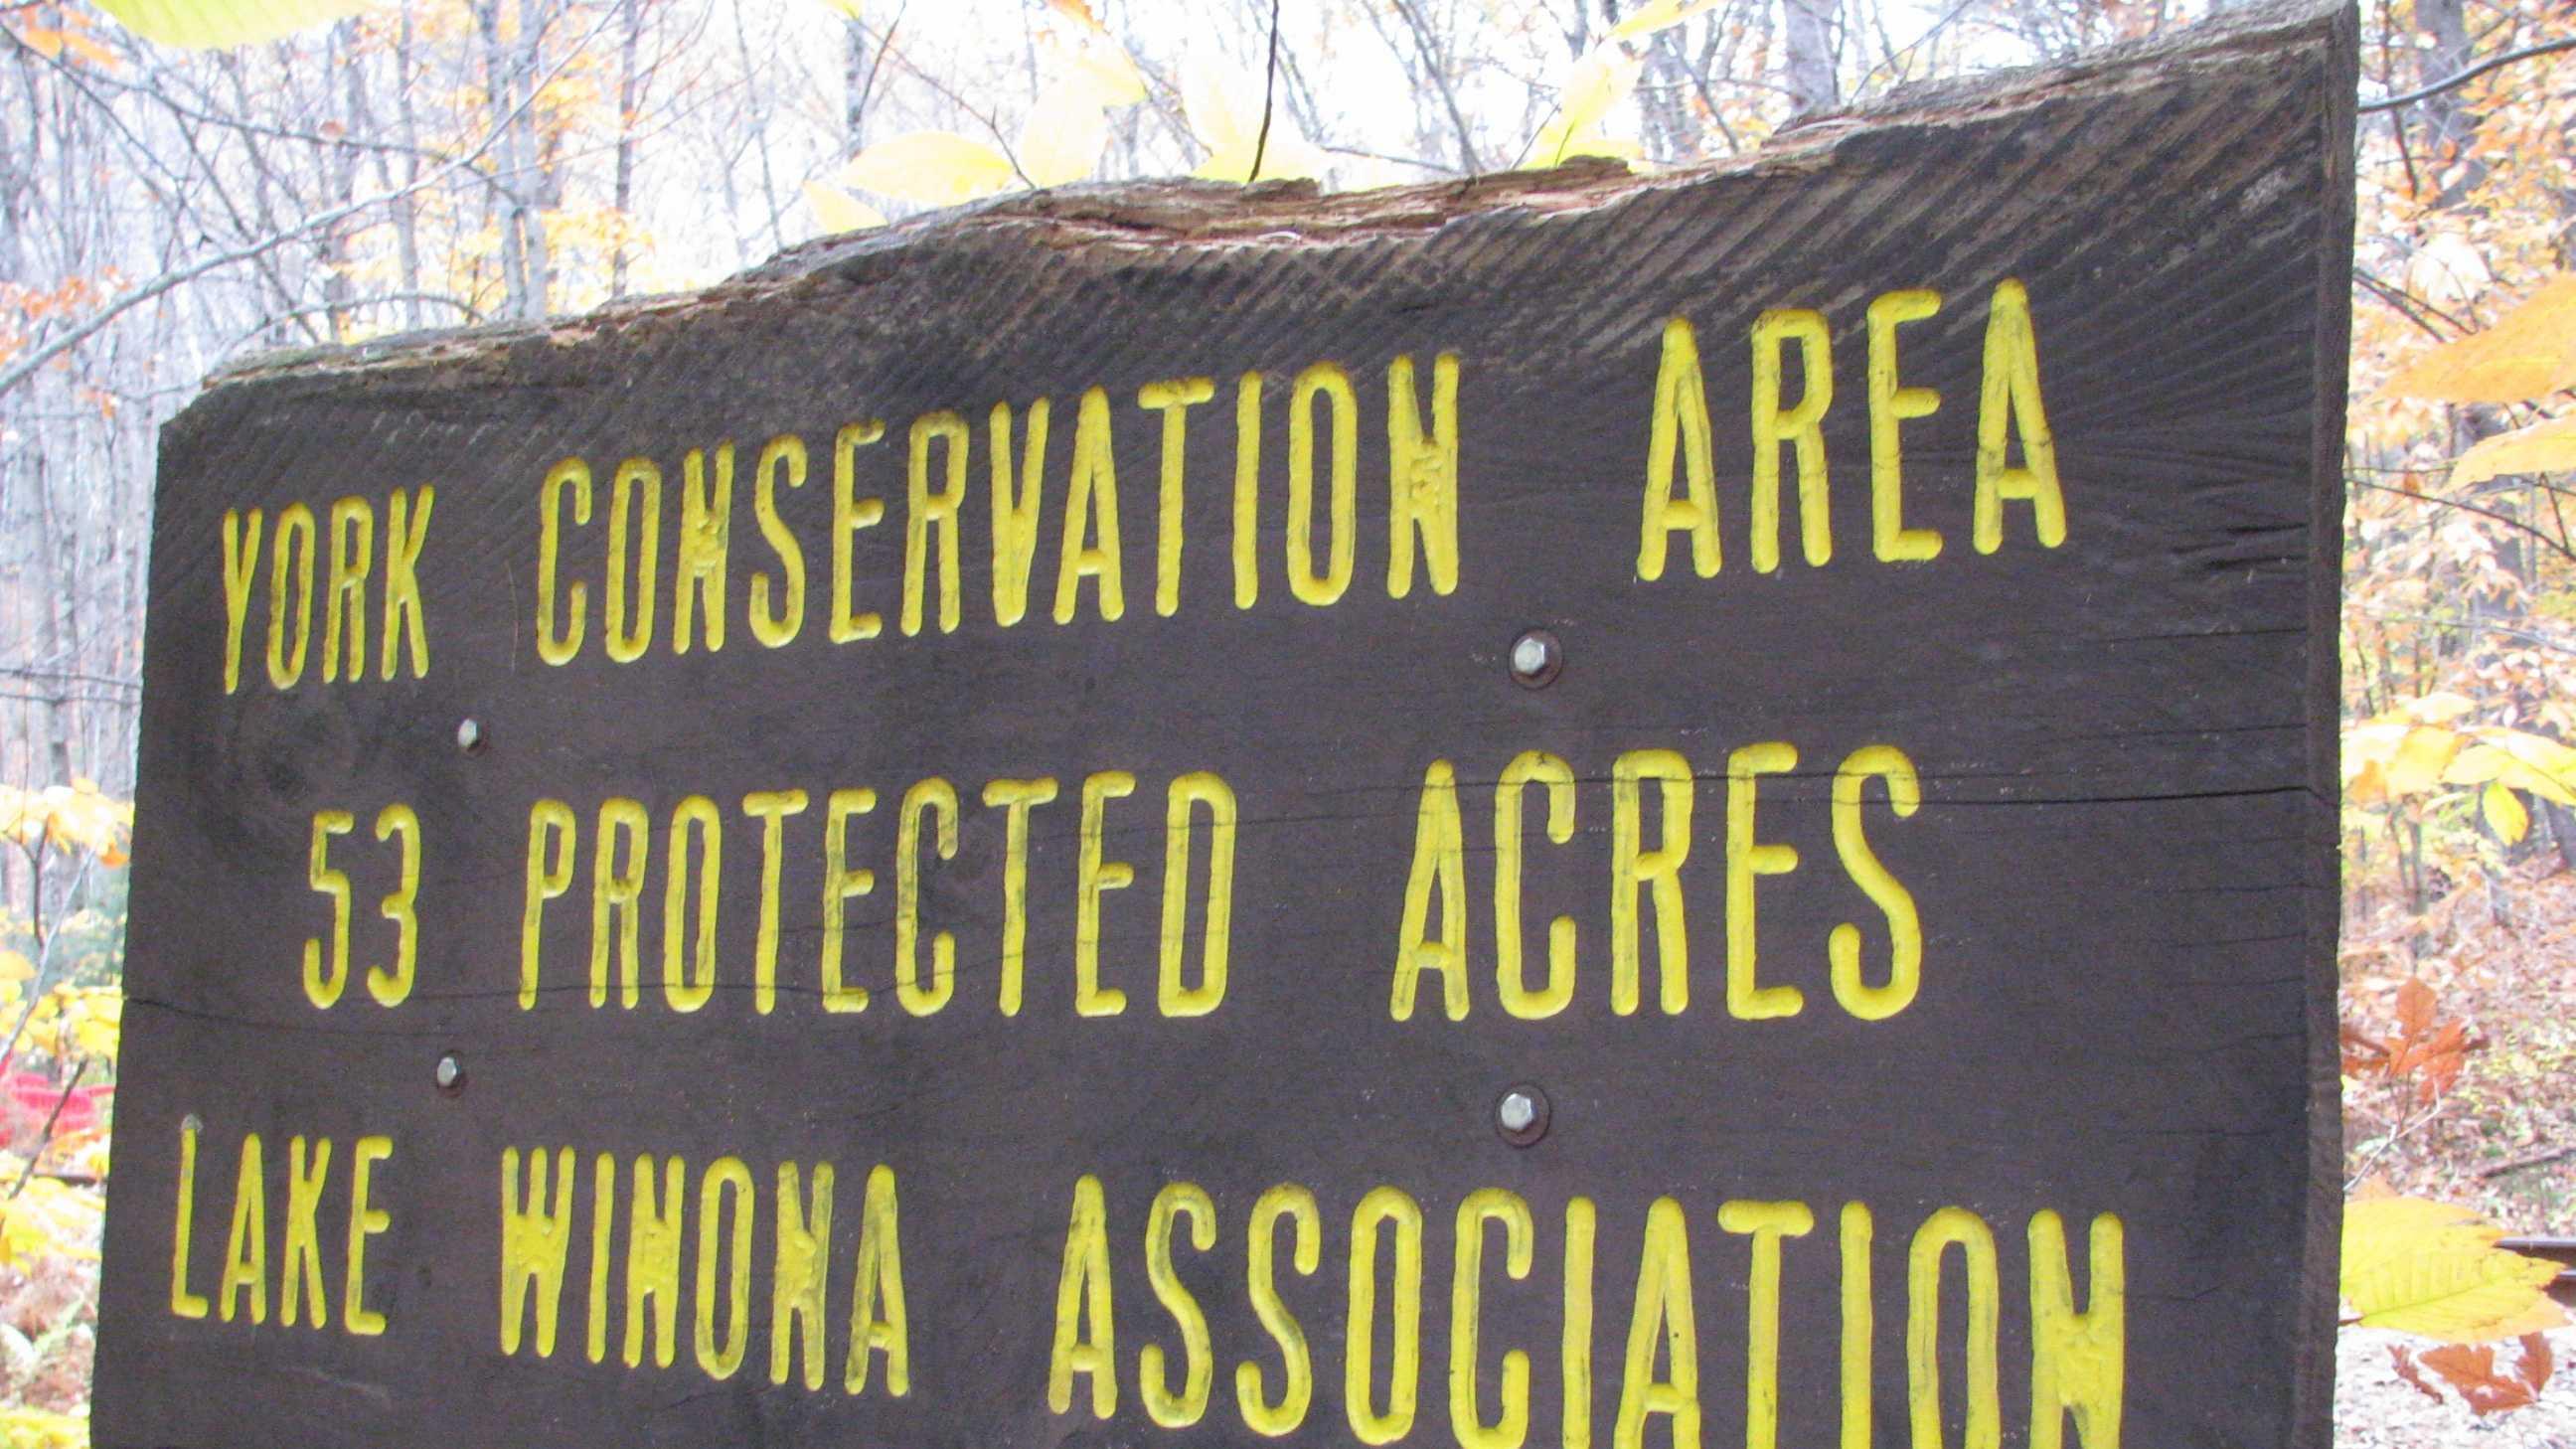 York Conservation Area